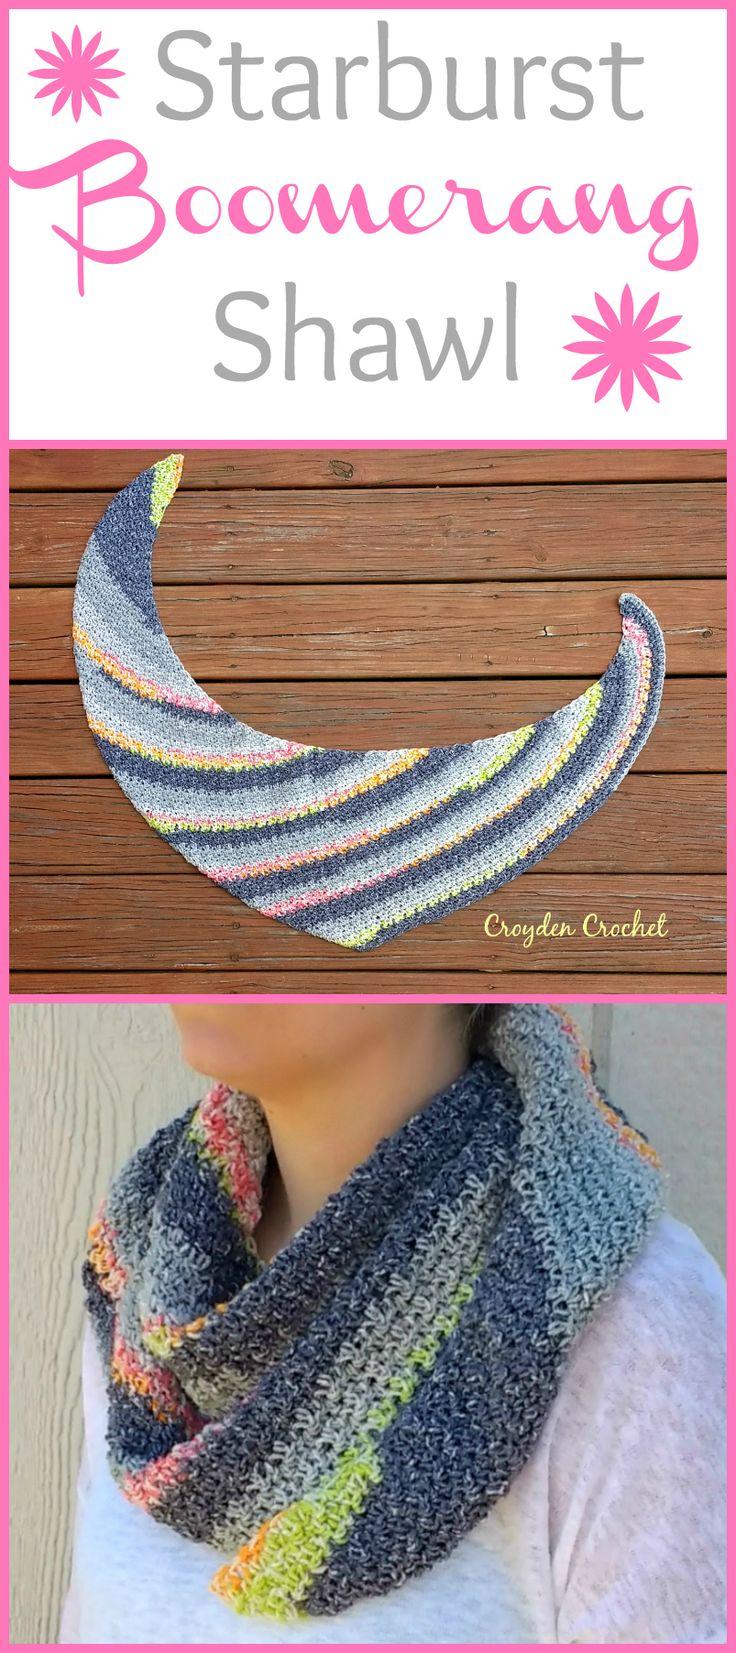 Best 25+ Crochet shawl patterns ideas on Pinterest Crochet shawl, Crochet s...